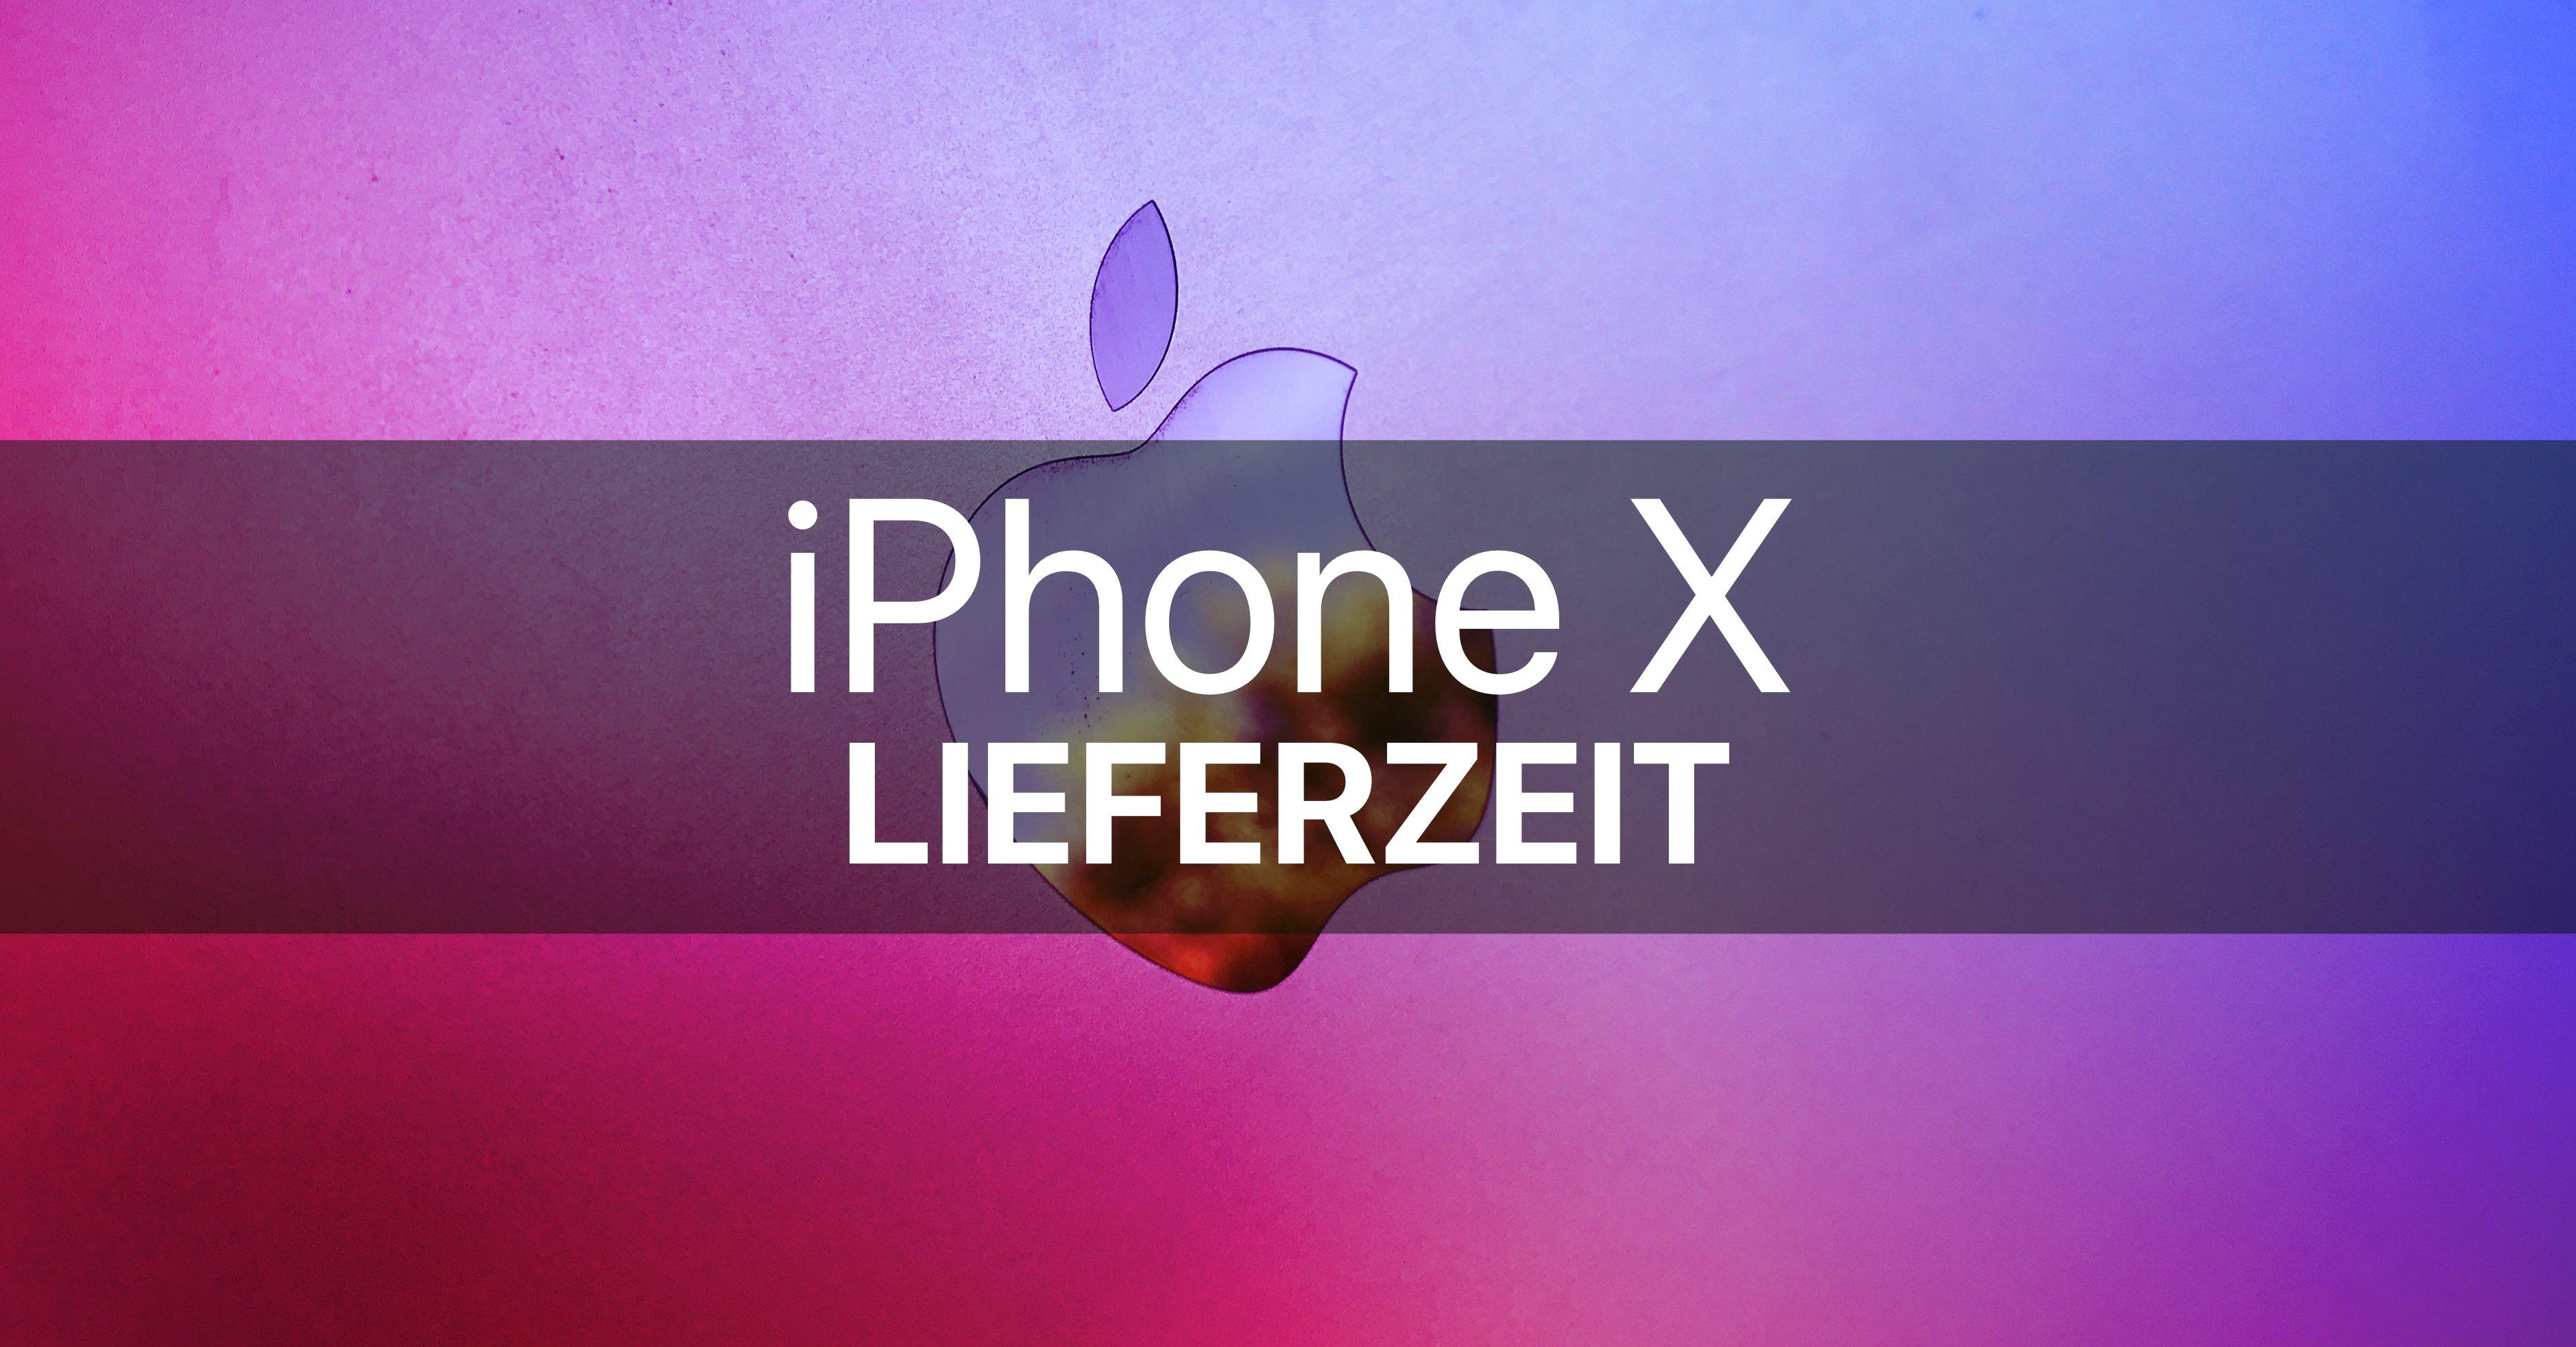 vodafone iphone x lieferstatus